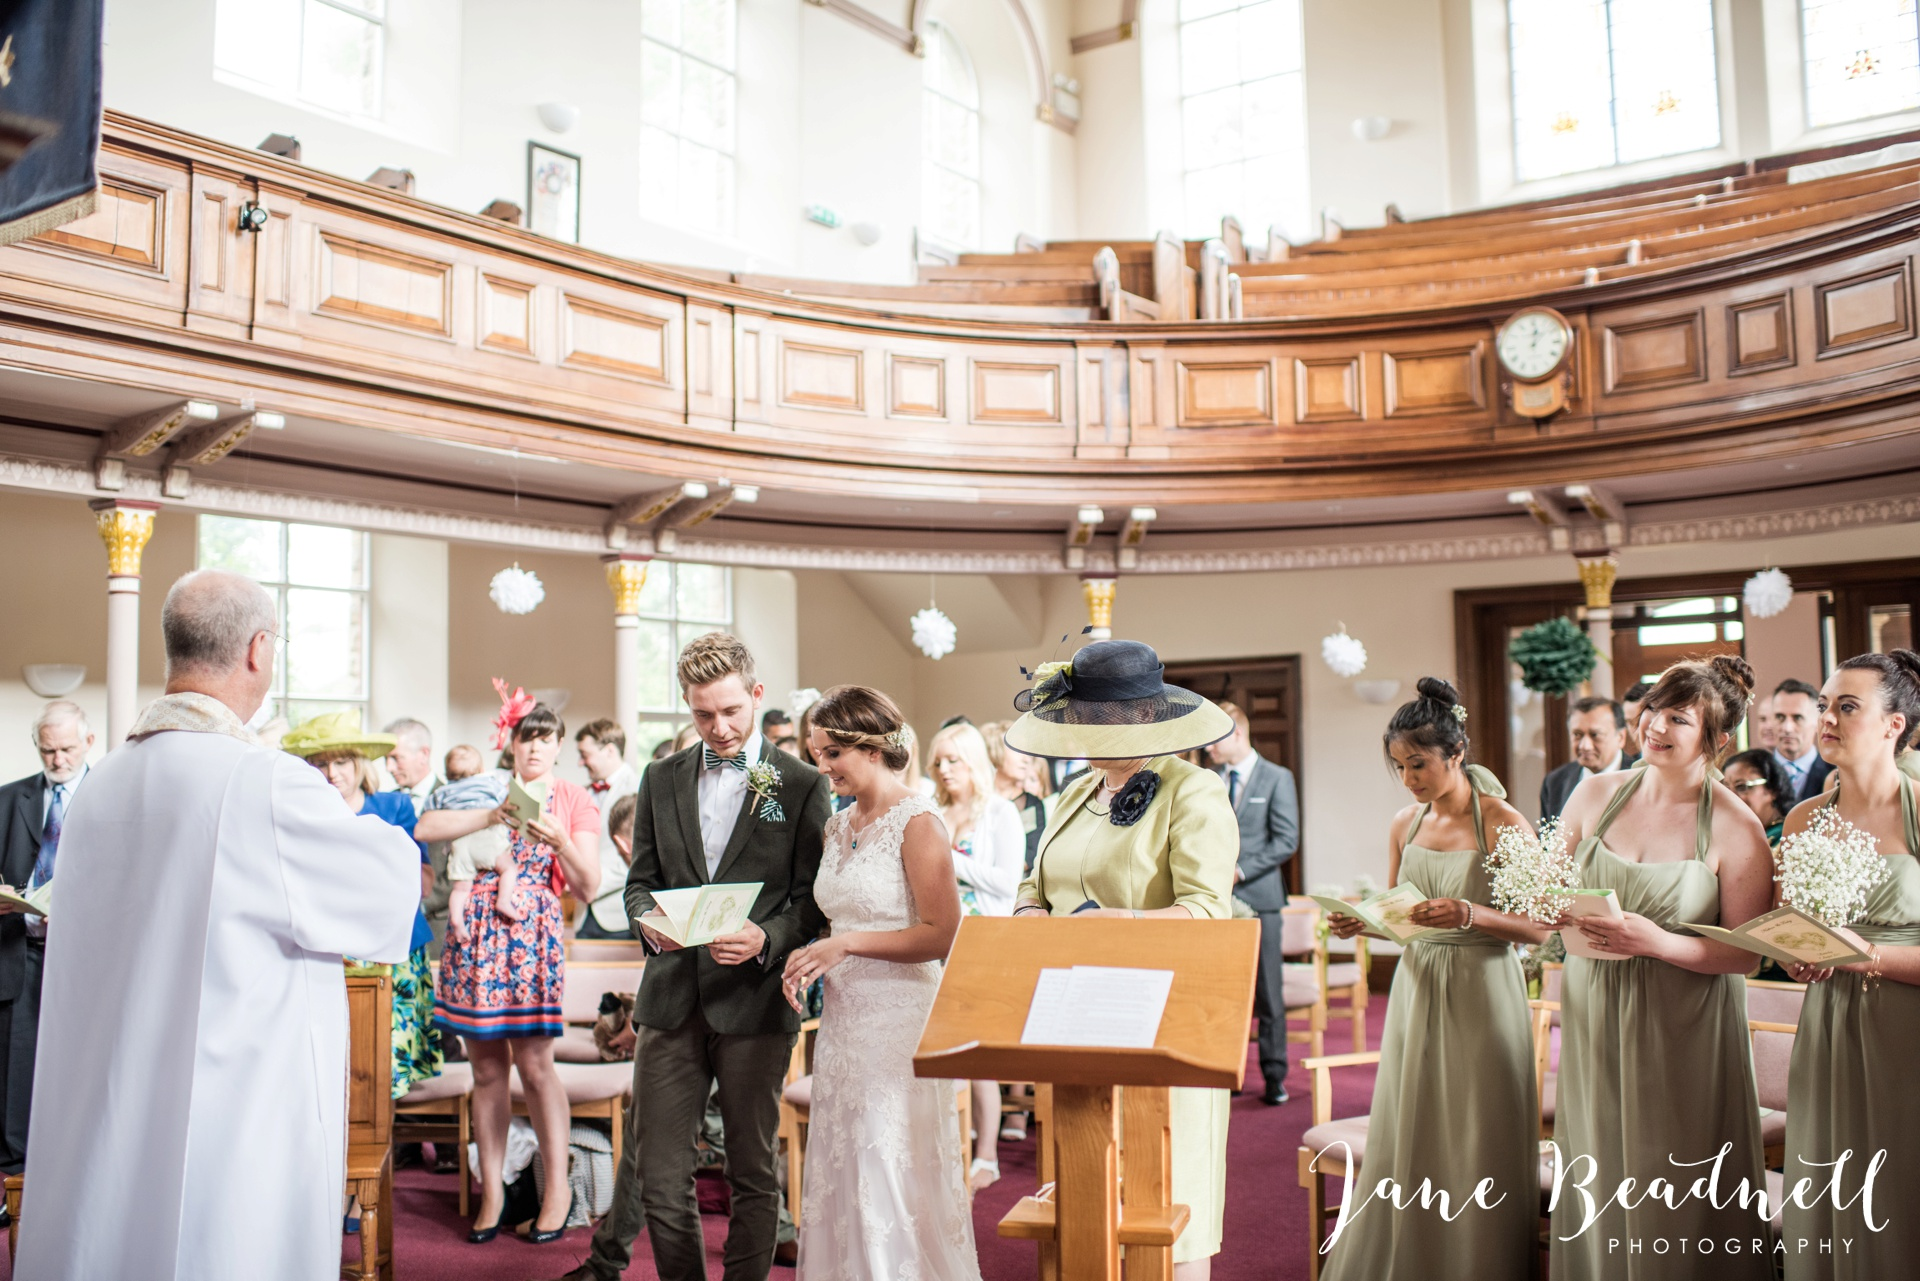 Jane Beadnell fine art wedding photographer The Old Deanery Ripon_0028